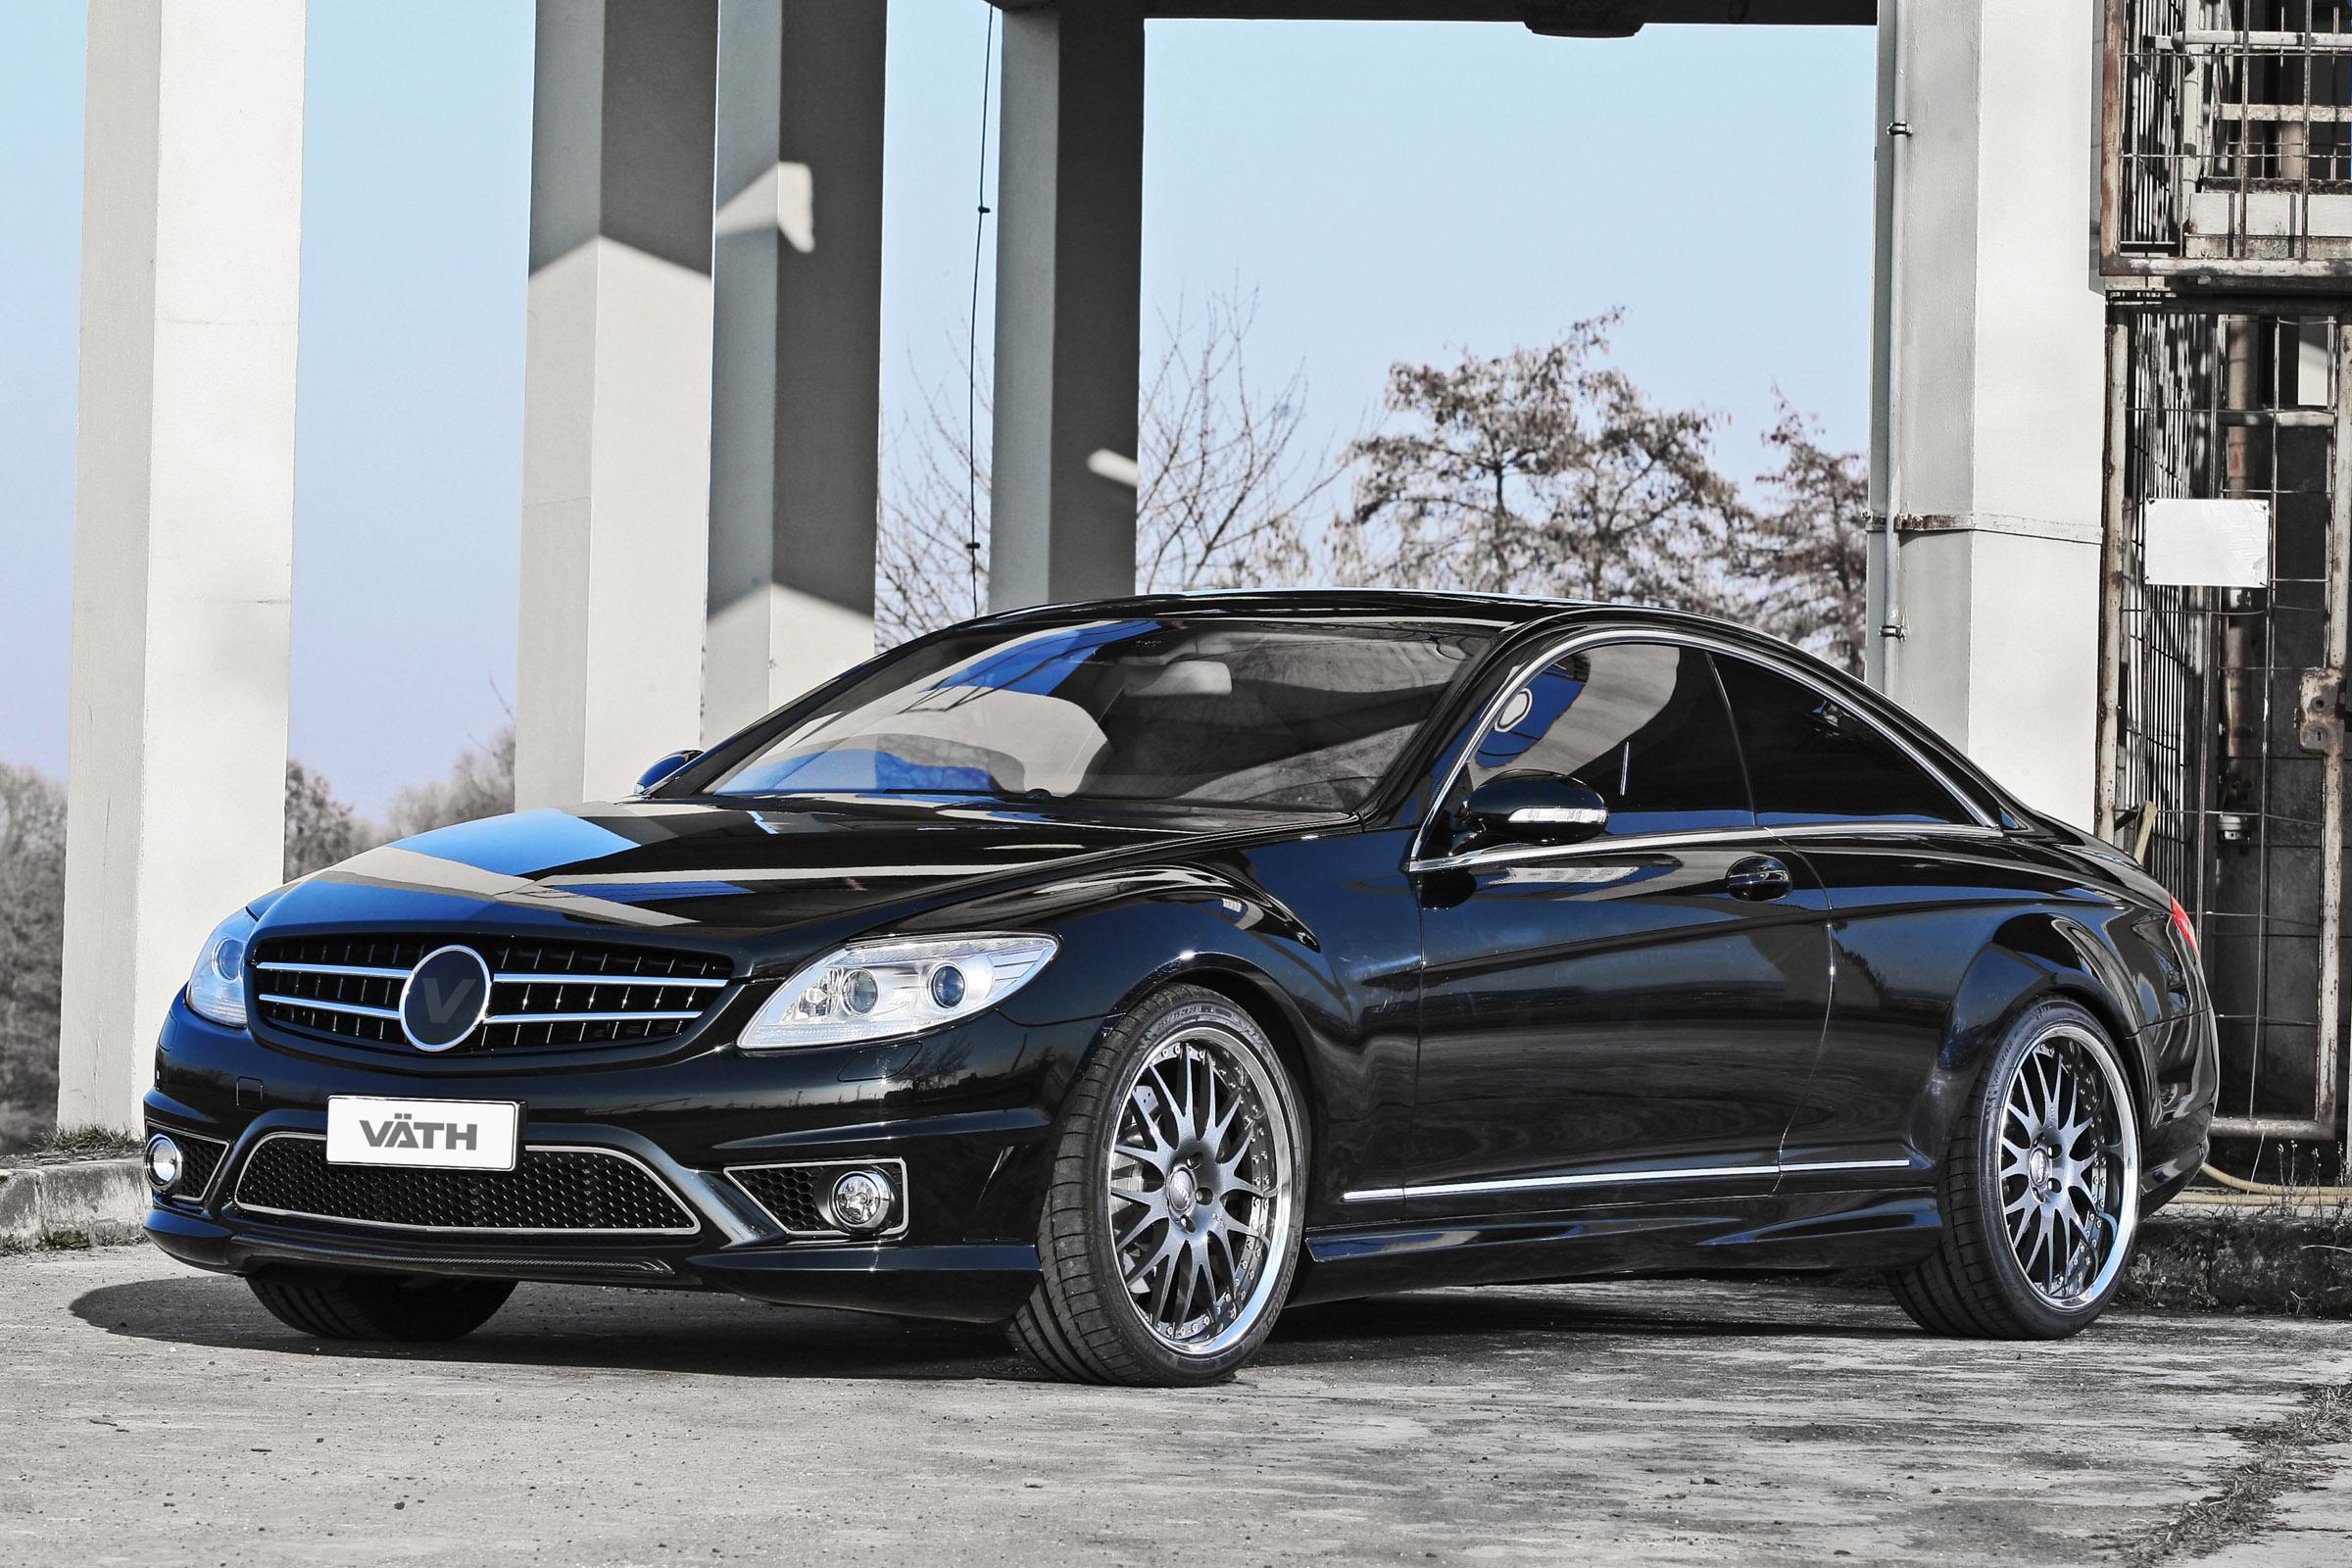 Vath mercedes cl500 for Mercedes benz cl500 review